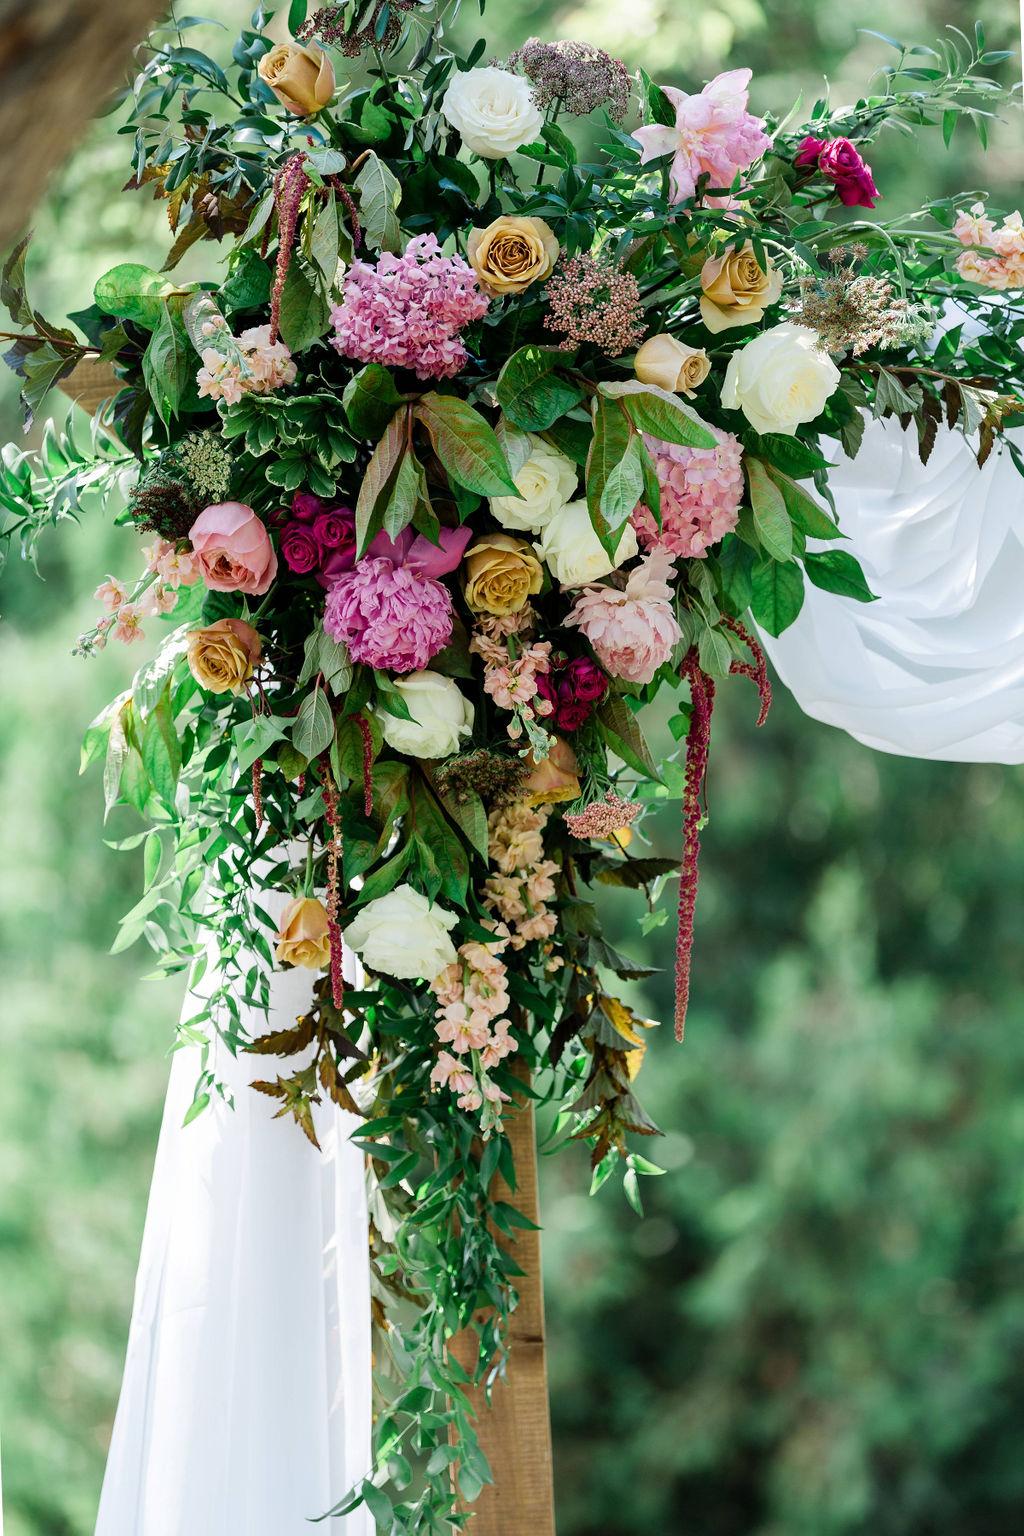 Kurtz-Orchards-Niagara-on-the-Lake-Styled-Wedding-Session-Shotlife-Studio-Calderone-Co-Luxury-Events-Vineyard-Bride-04.JPG